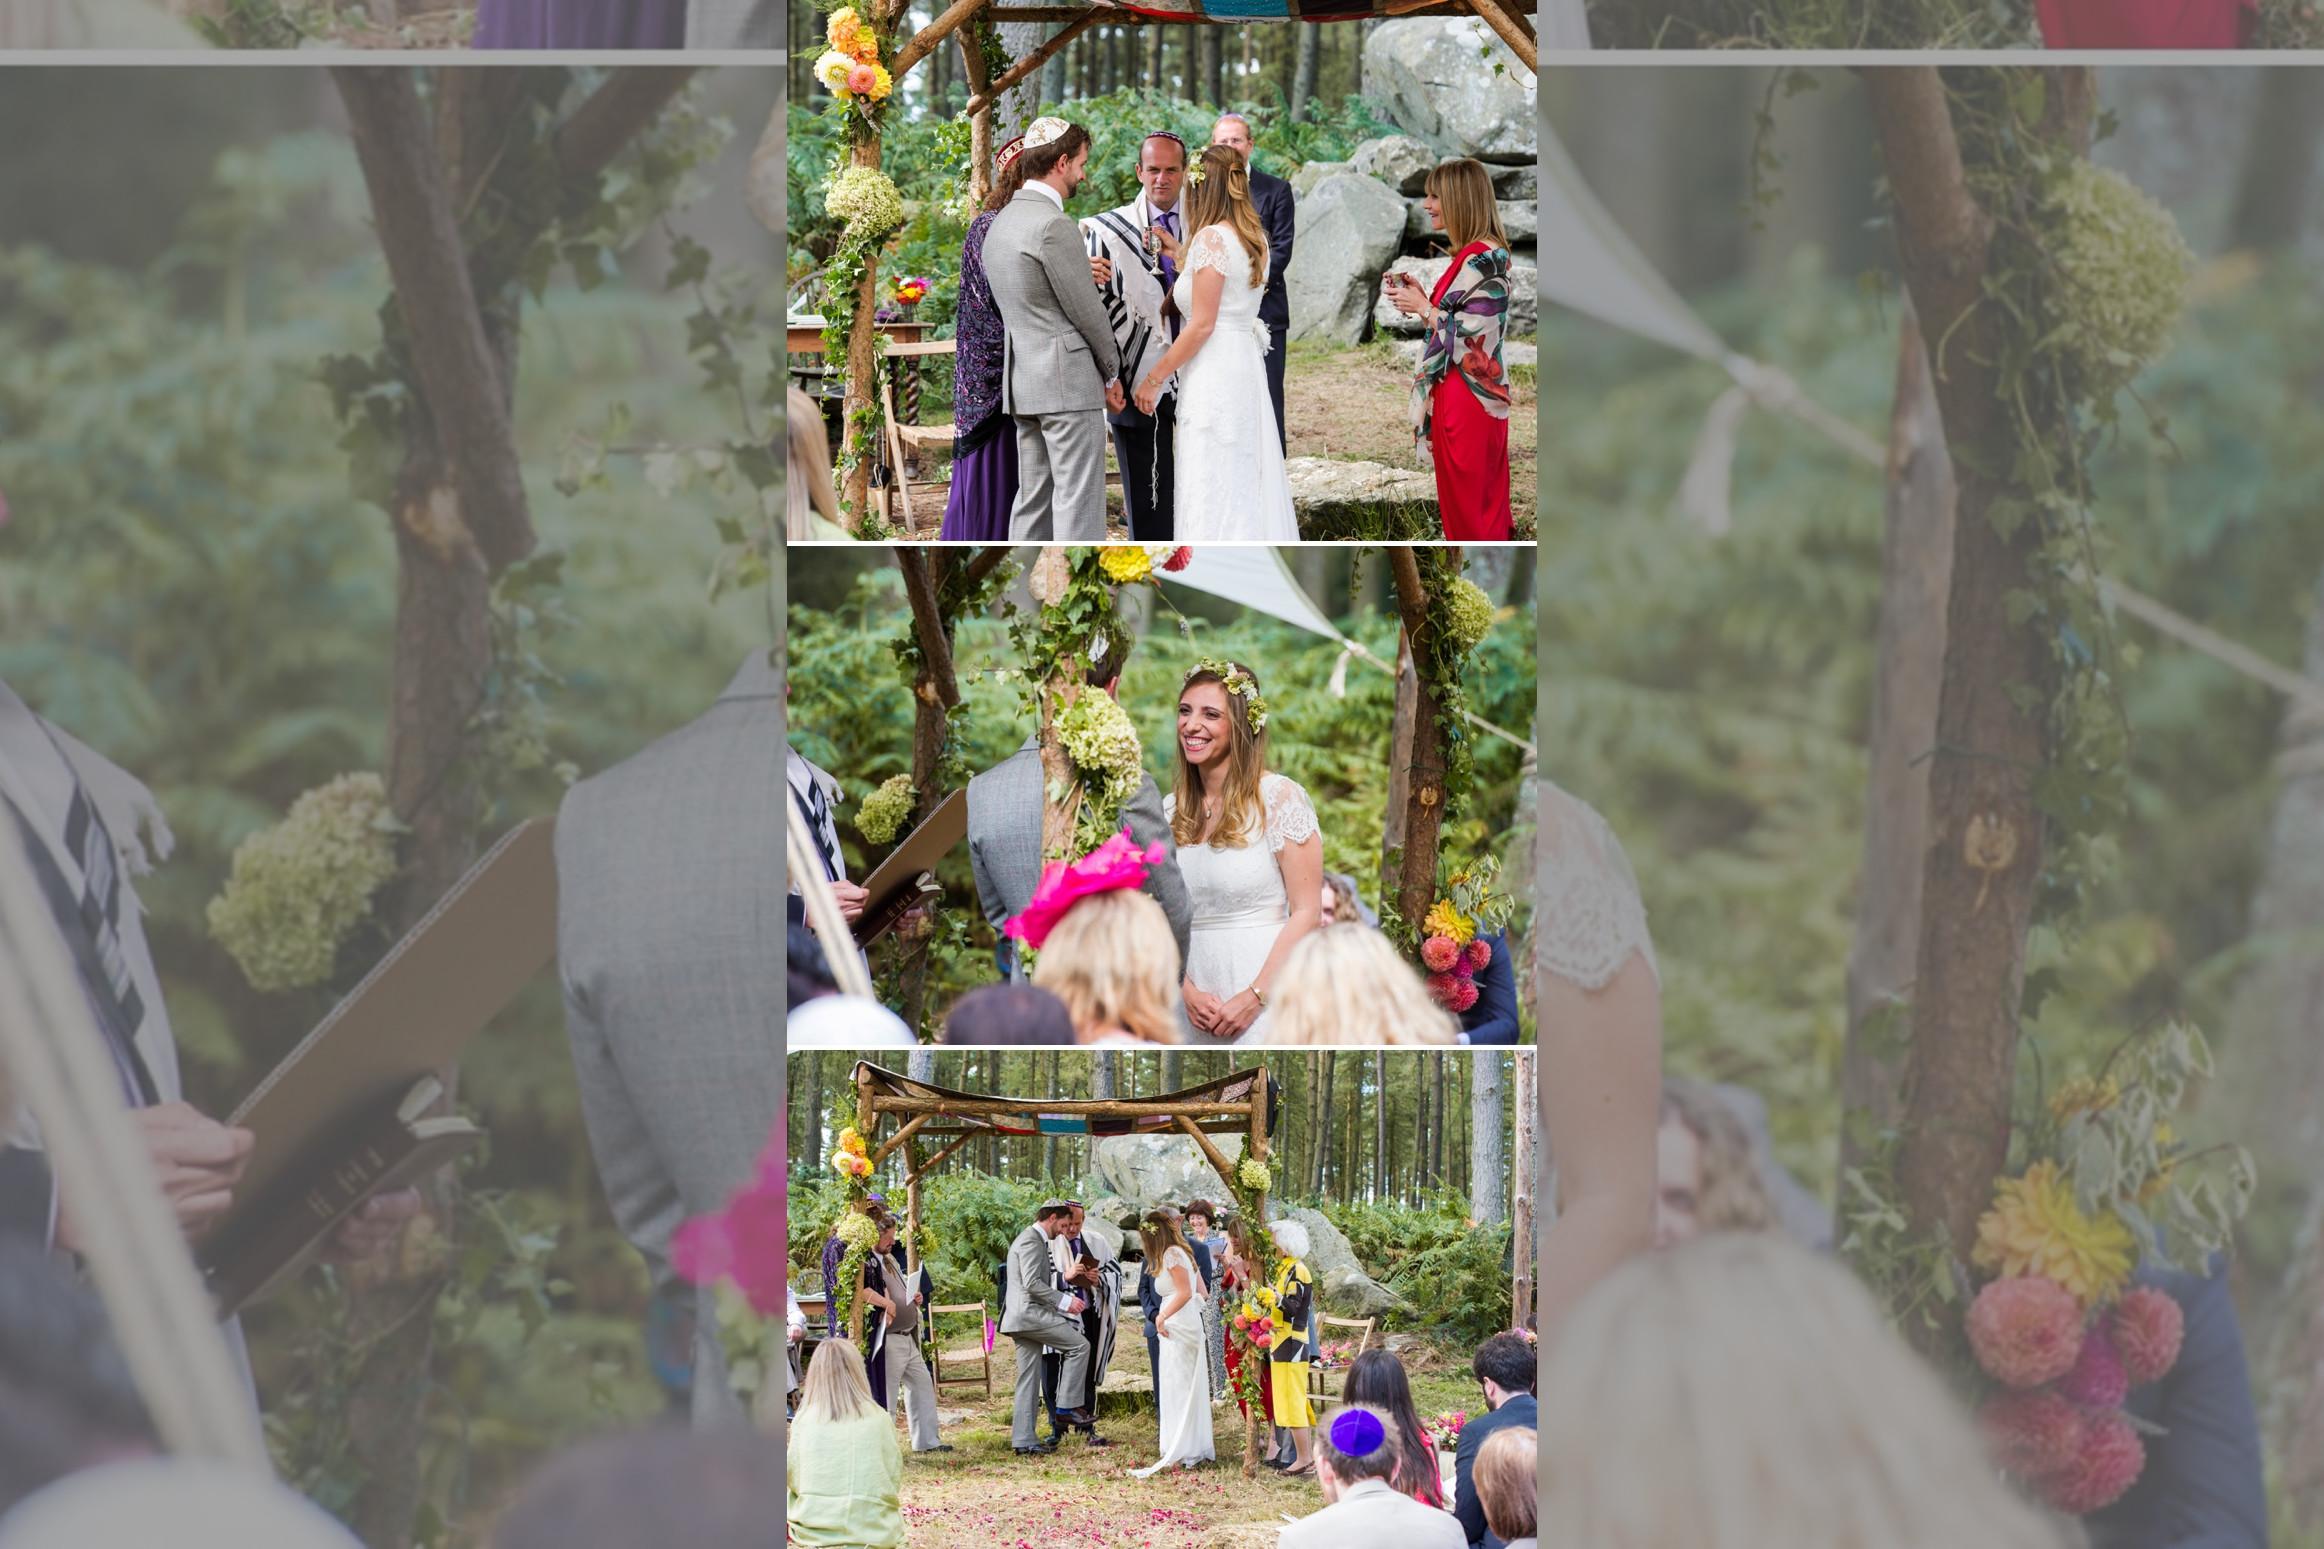 Bridebook.co.uk collection of 3 jewish wedding photos